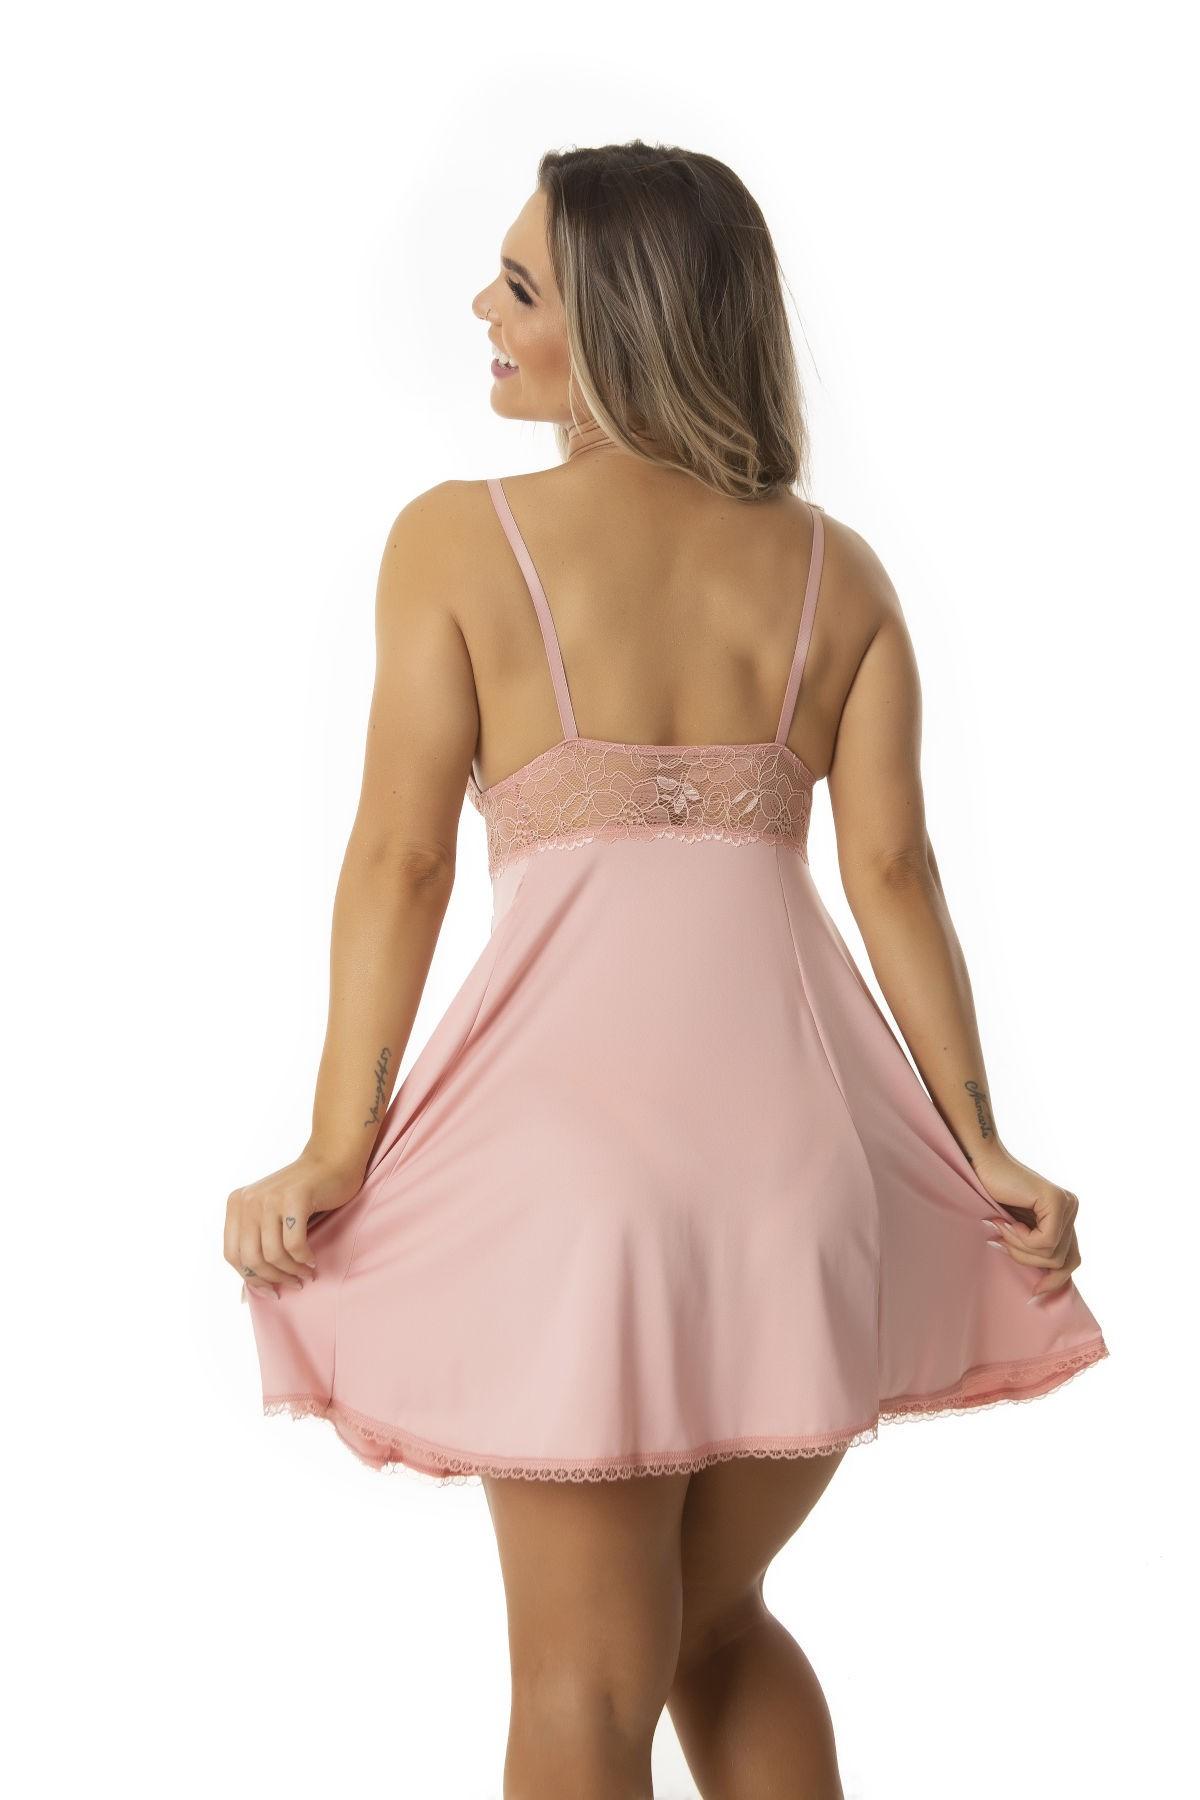 Camisola Feminina Sexy Pijama Lingerie Renda Anita Luxo